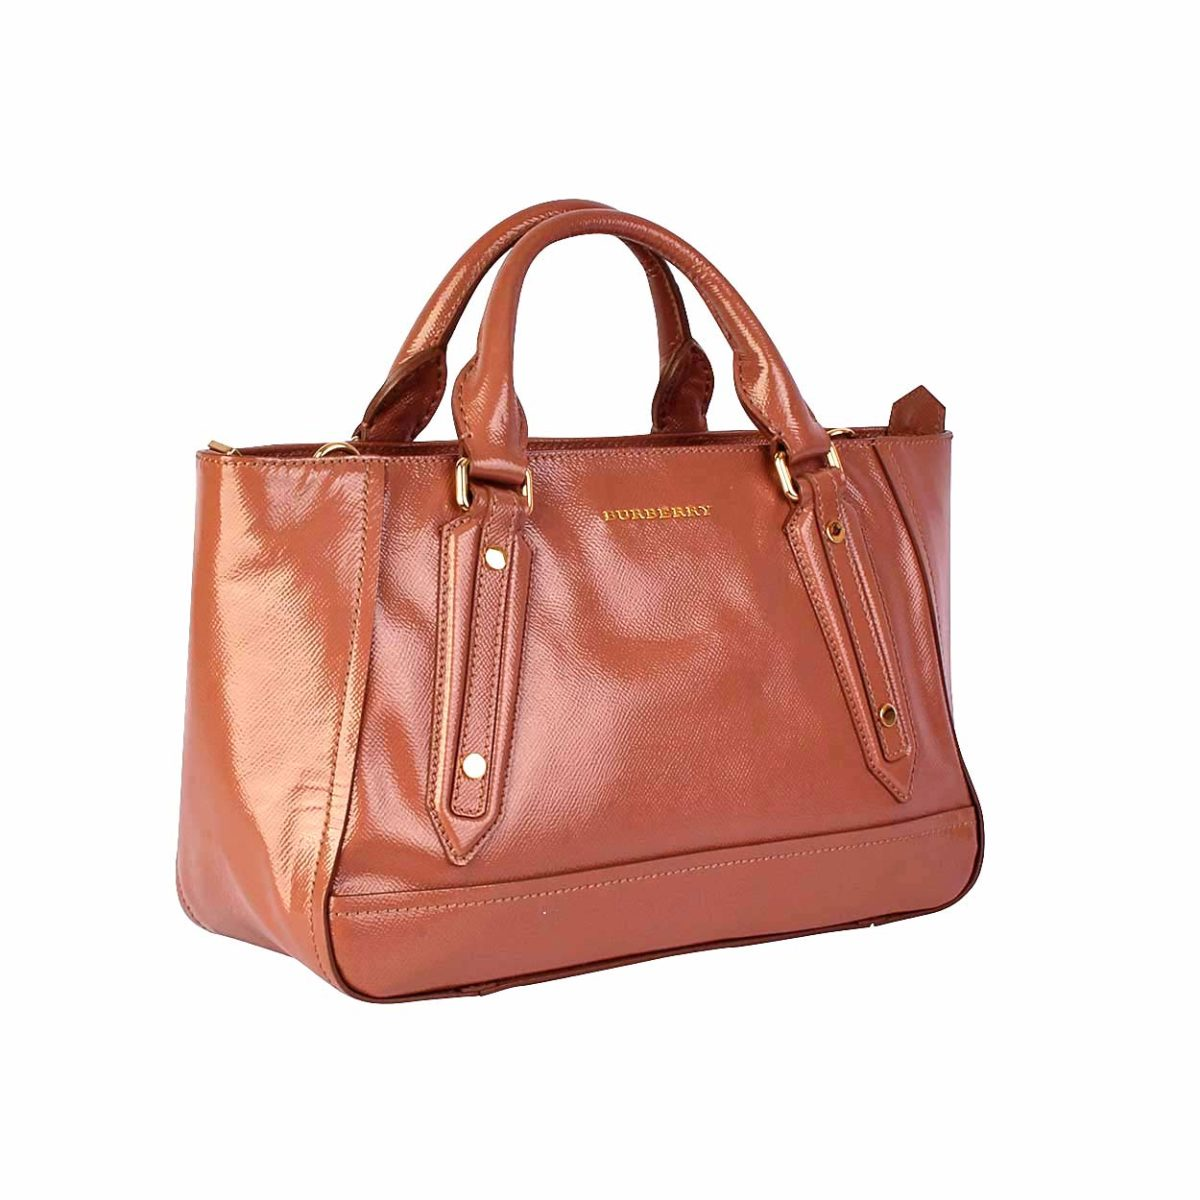 88c1a47123c1 BURBERRY London Patent Leather Shopper Rose